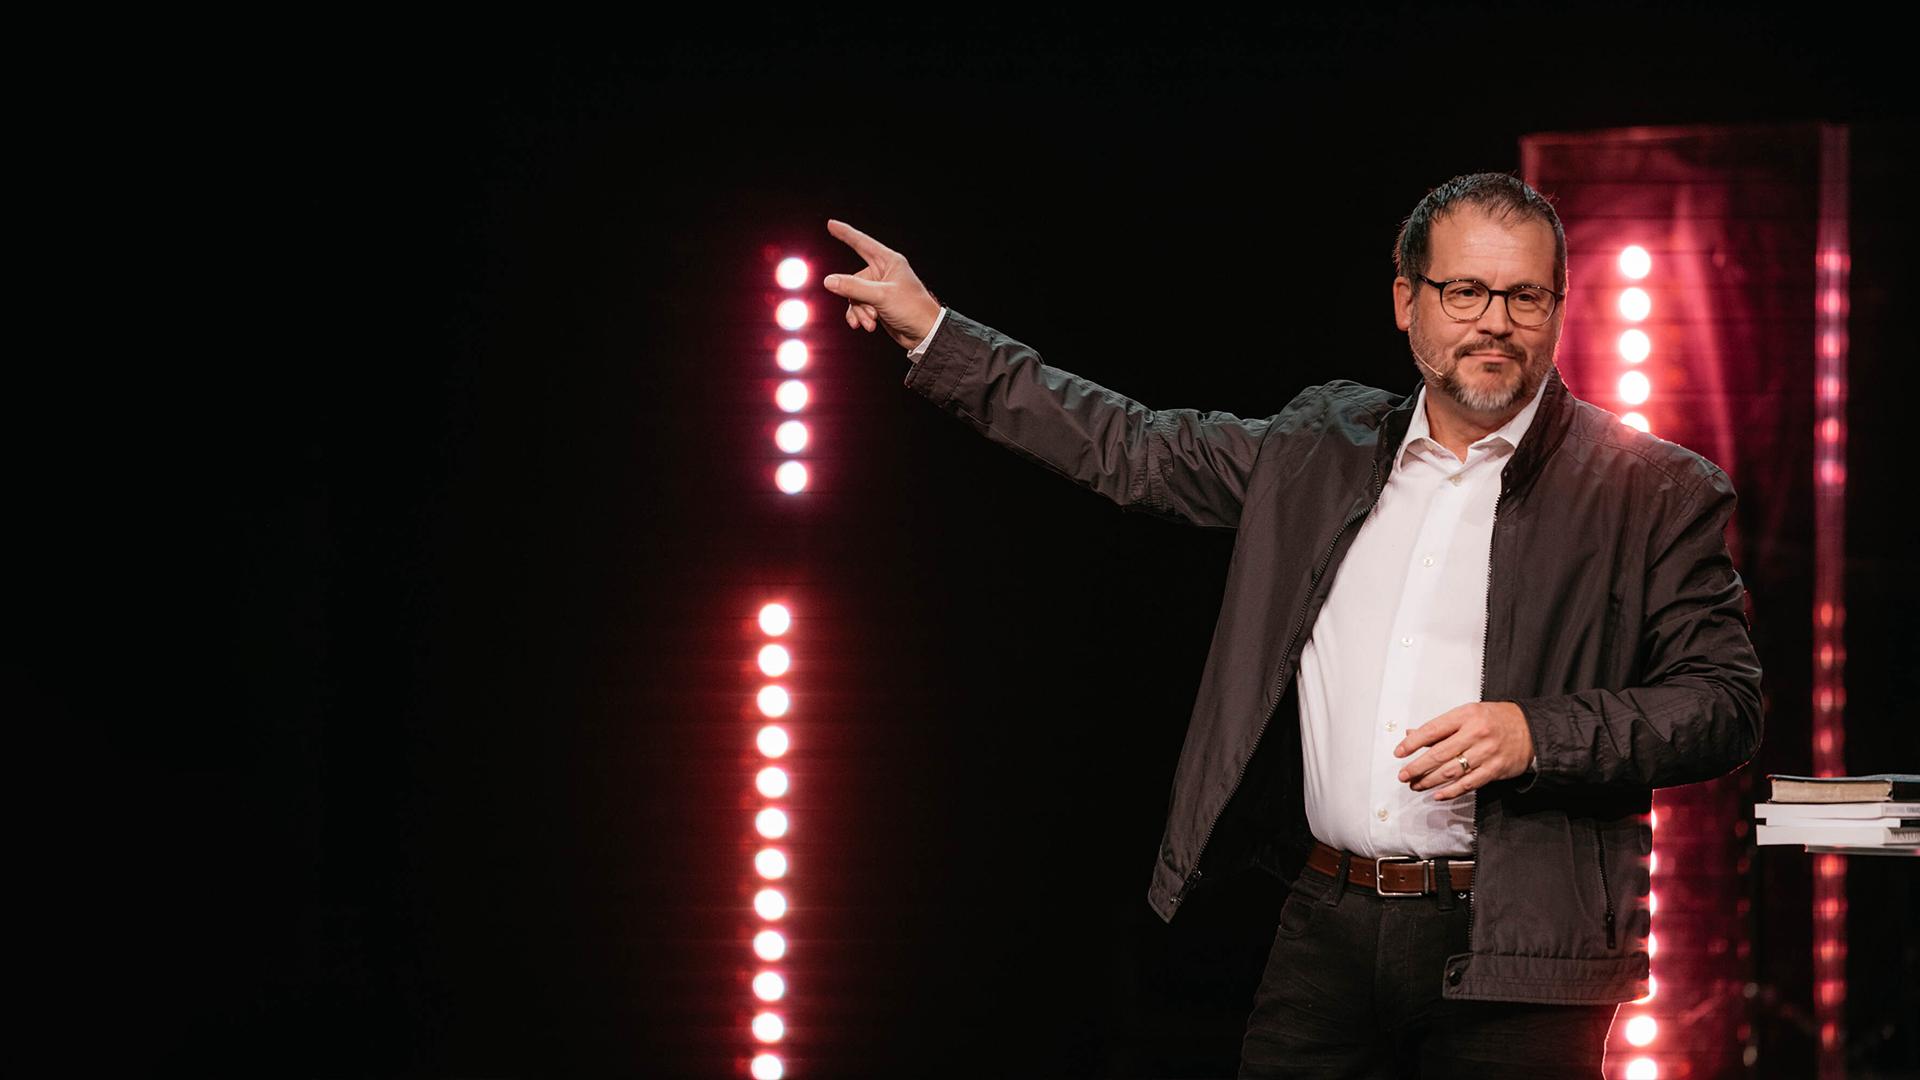 Derrick Hamre Preaching